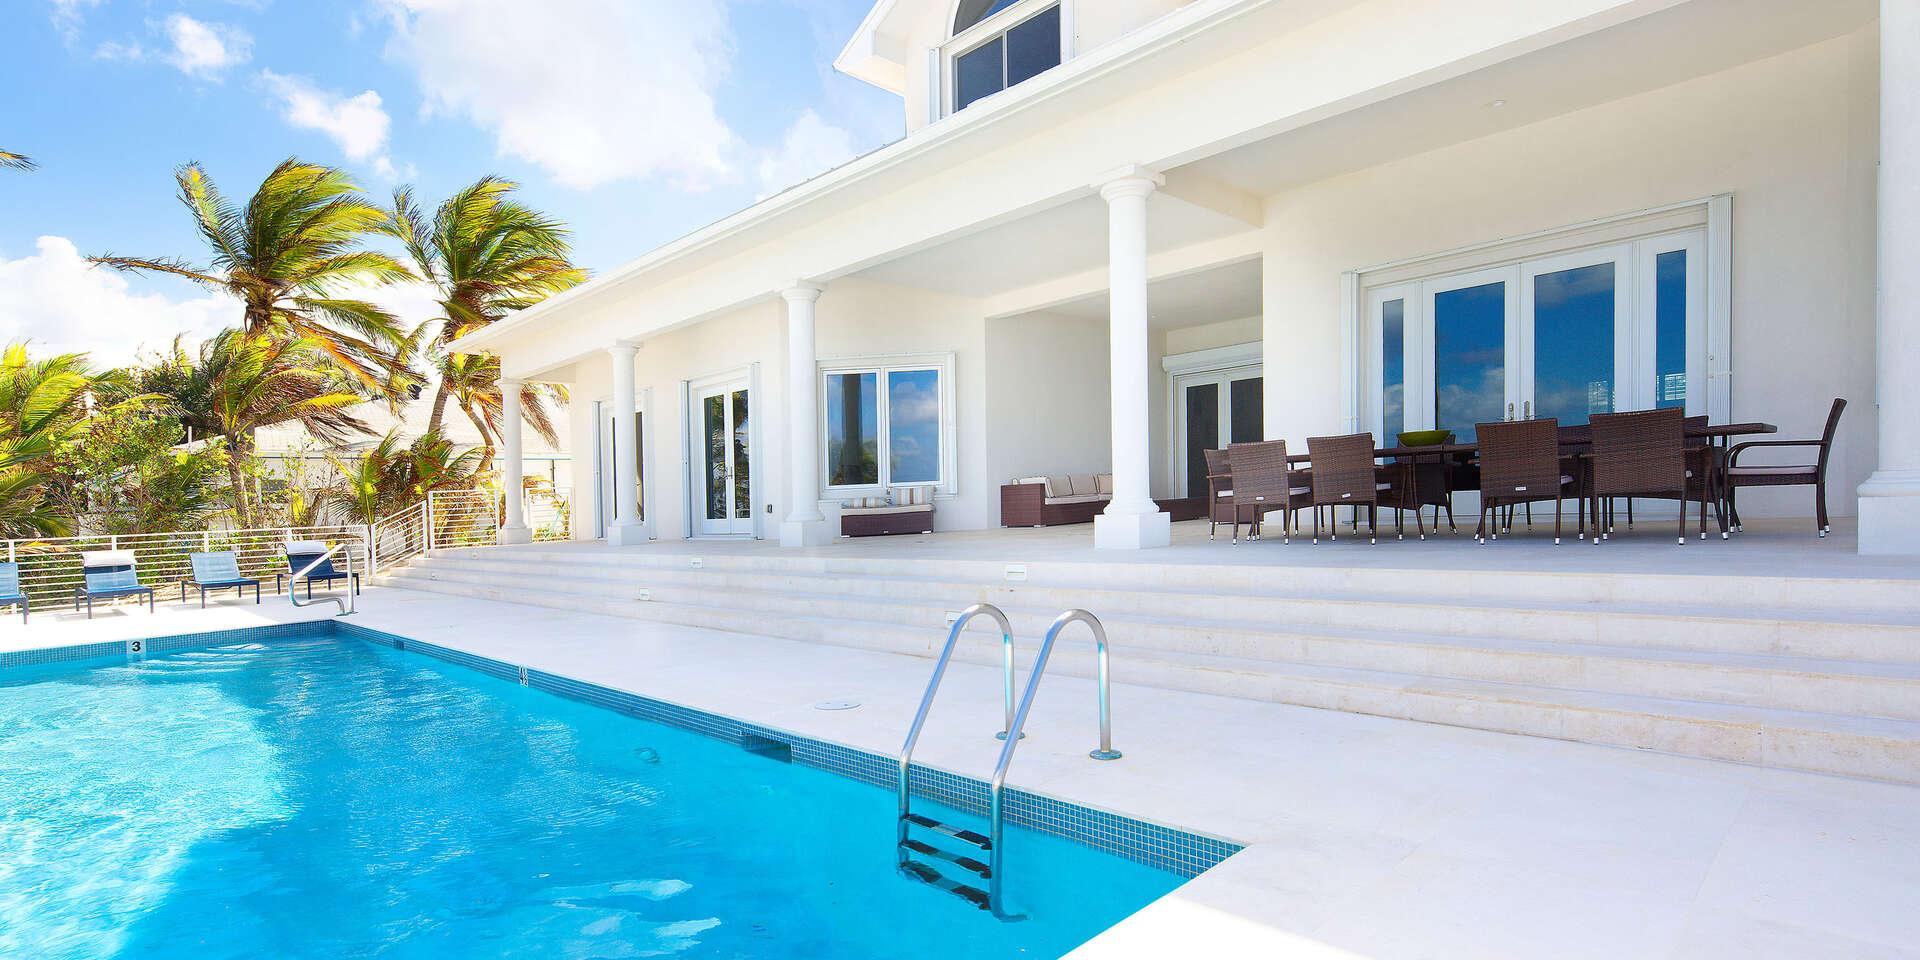 Luxury villa rentals caribbean - Cayman islands - Grand cayman - Cayman kai - Ocean Kai - Image 1/23